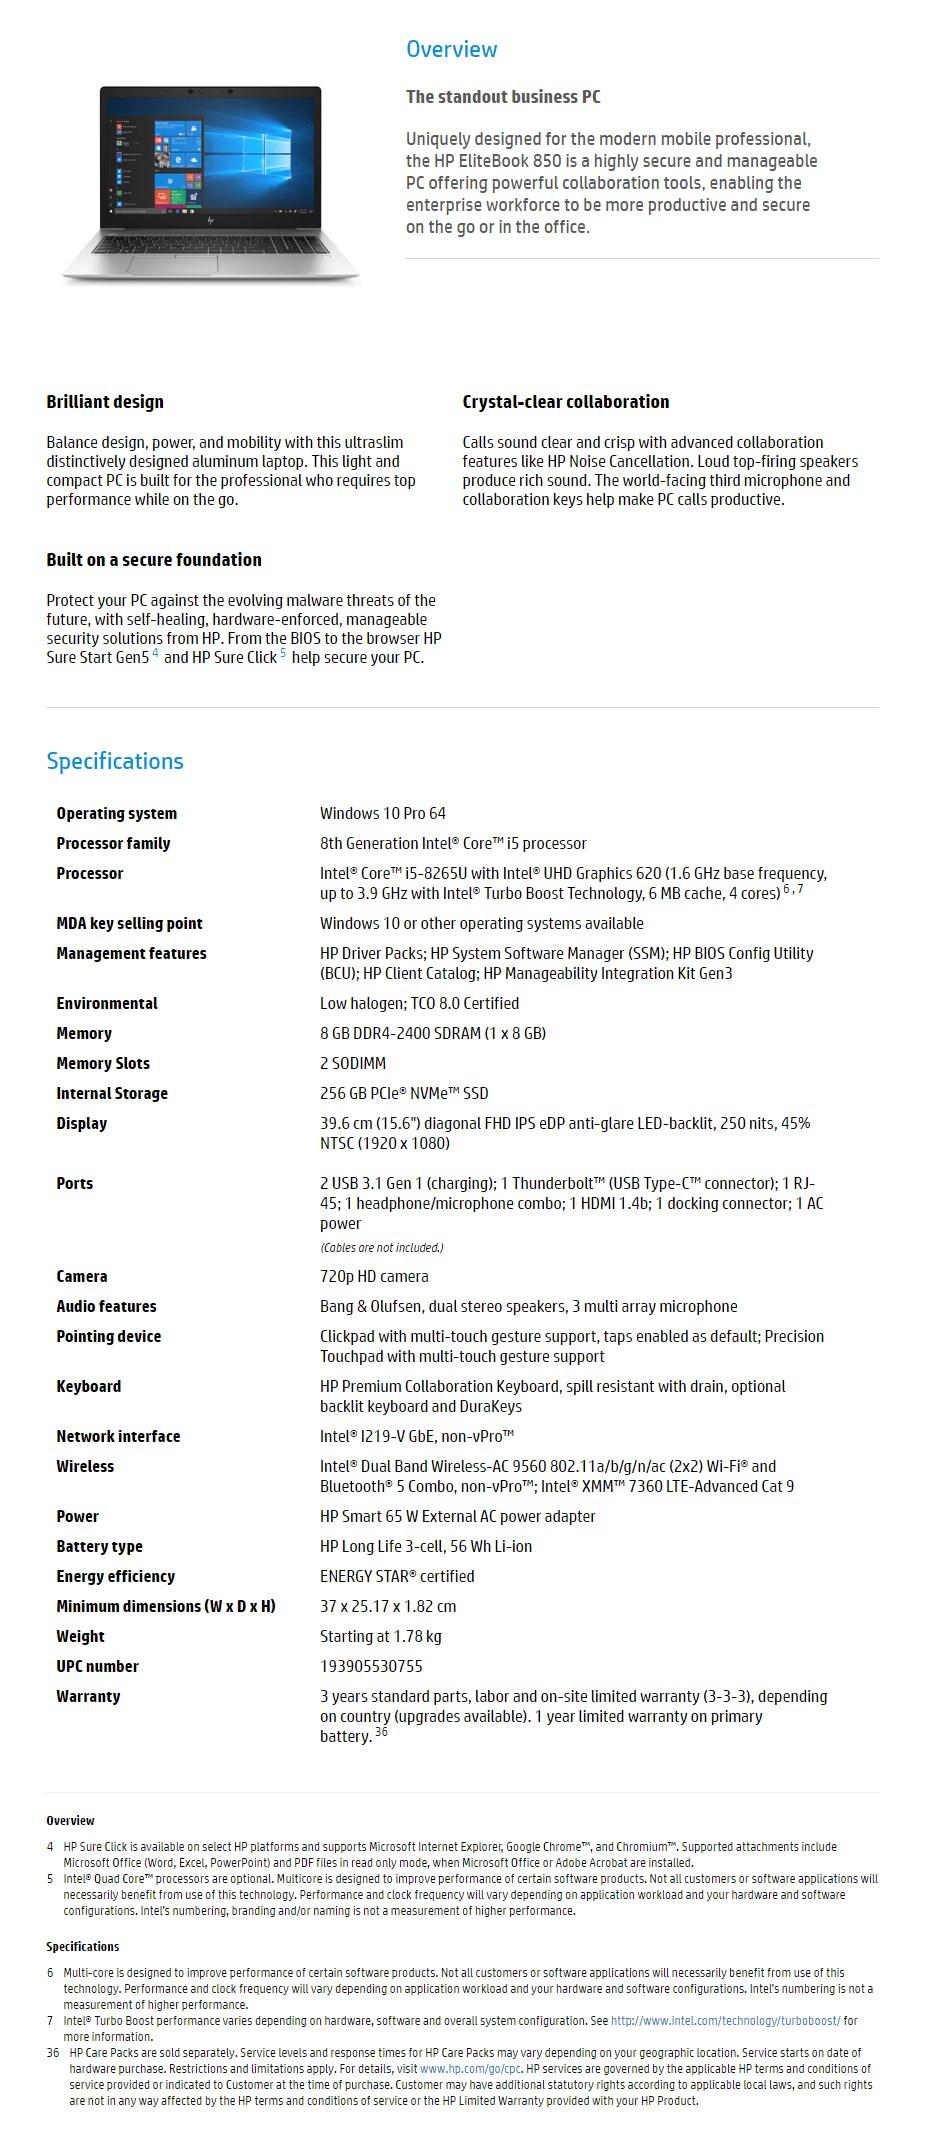 "HP EliteBook 850 G6 15.6"" Laptop i5-8265U 8GB 256GB W10P 4G - Overview 1"